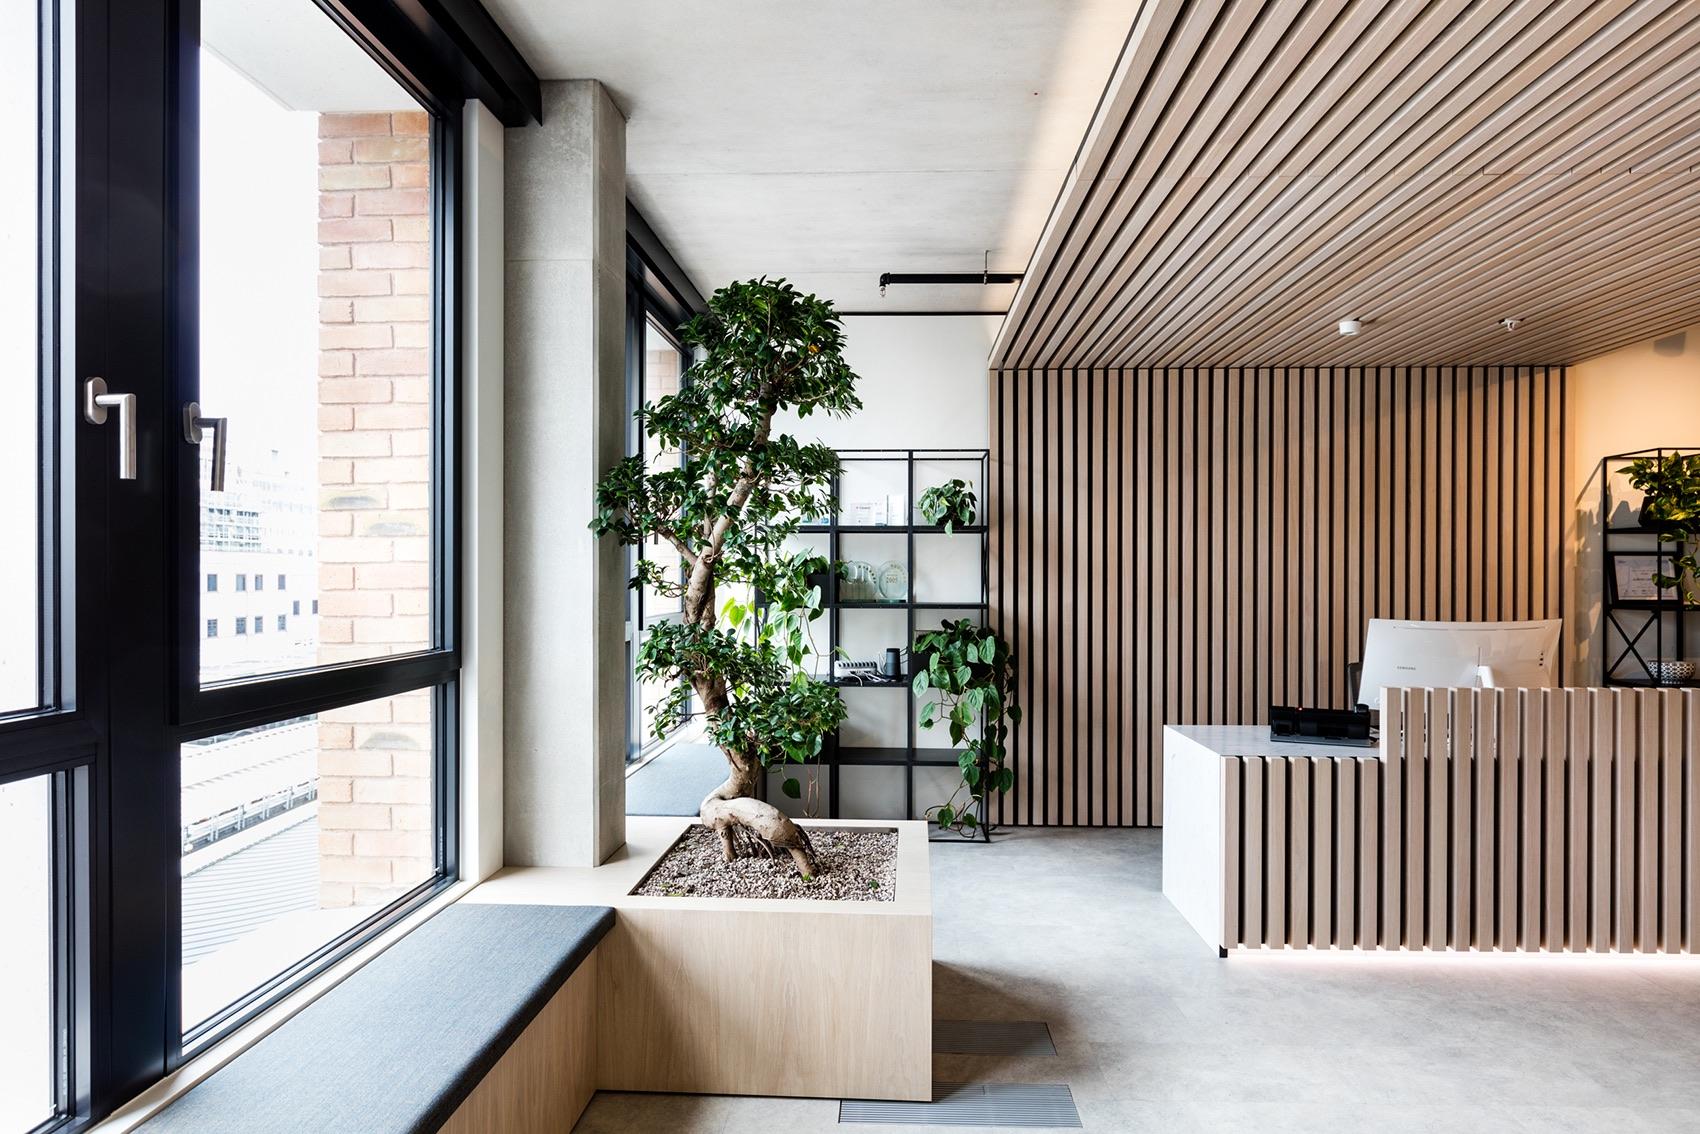 albion-capital-london-office-4